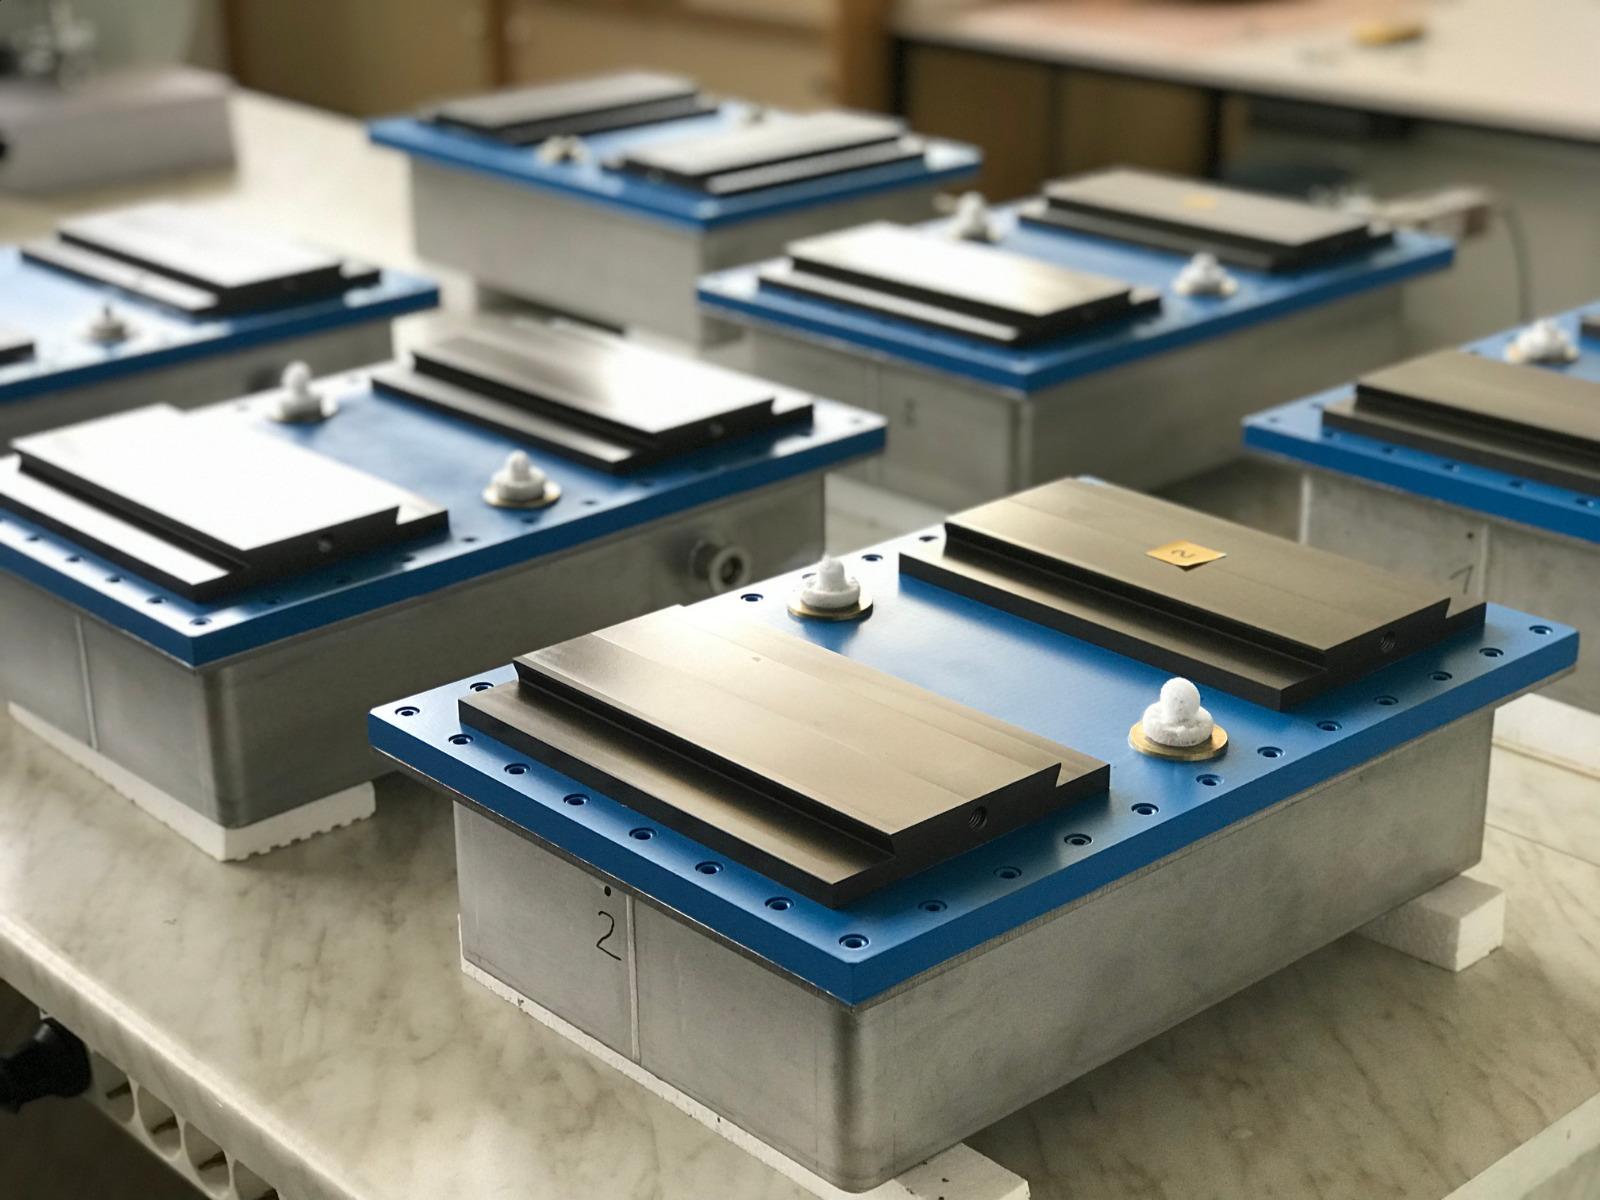 Mass production of maglev cryostats